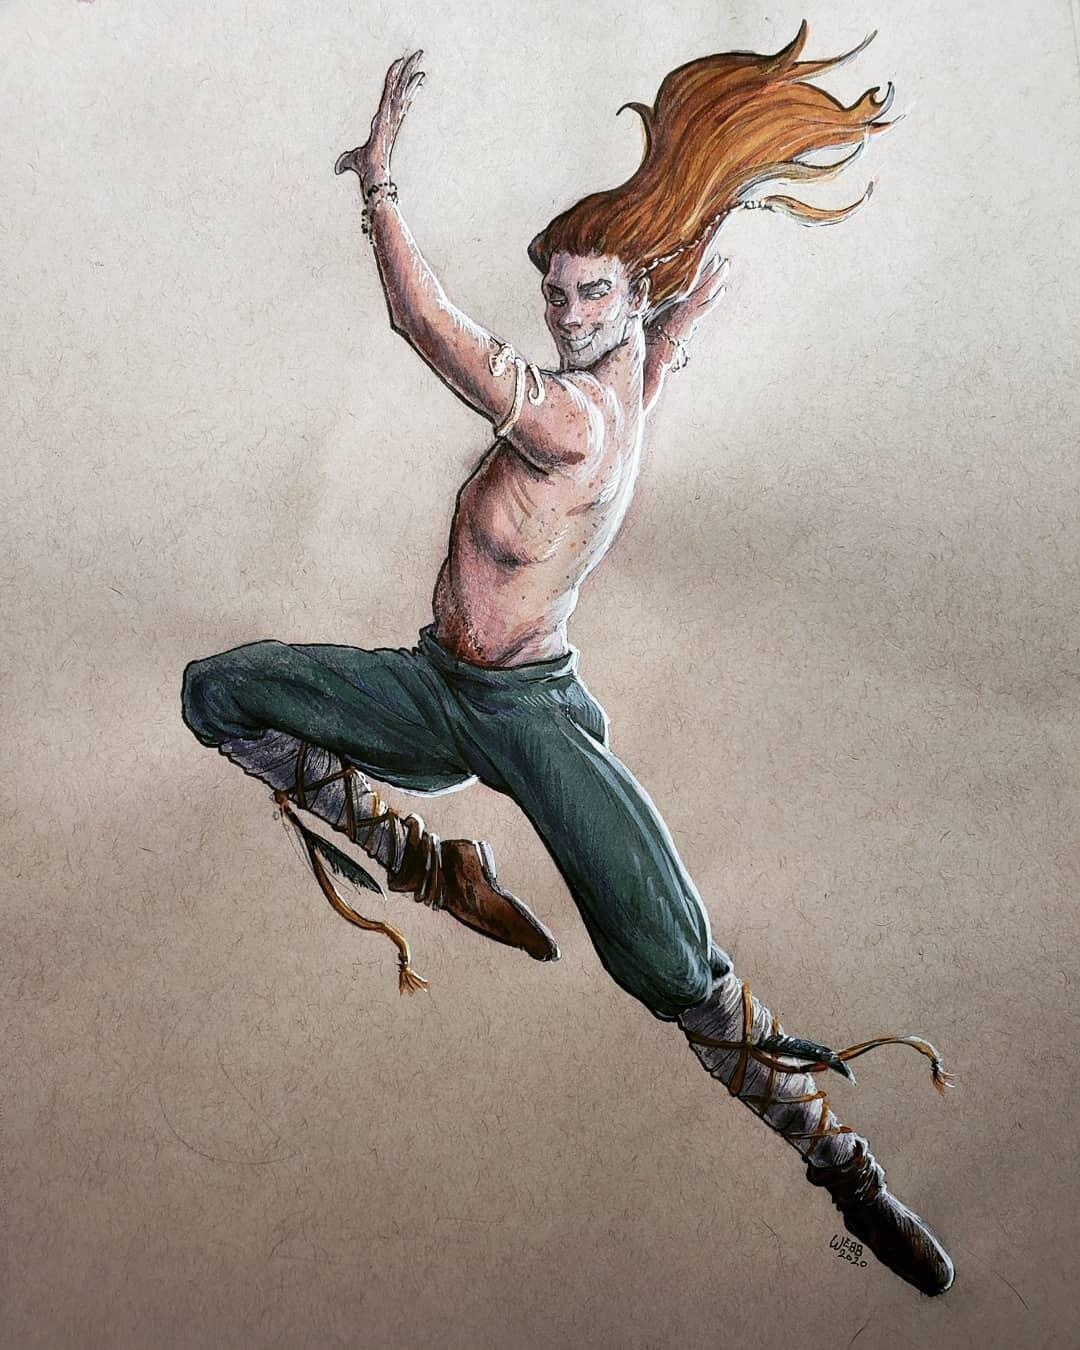 PreOrder Loki Dance Print 5x7